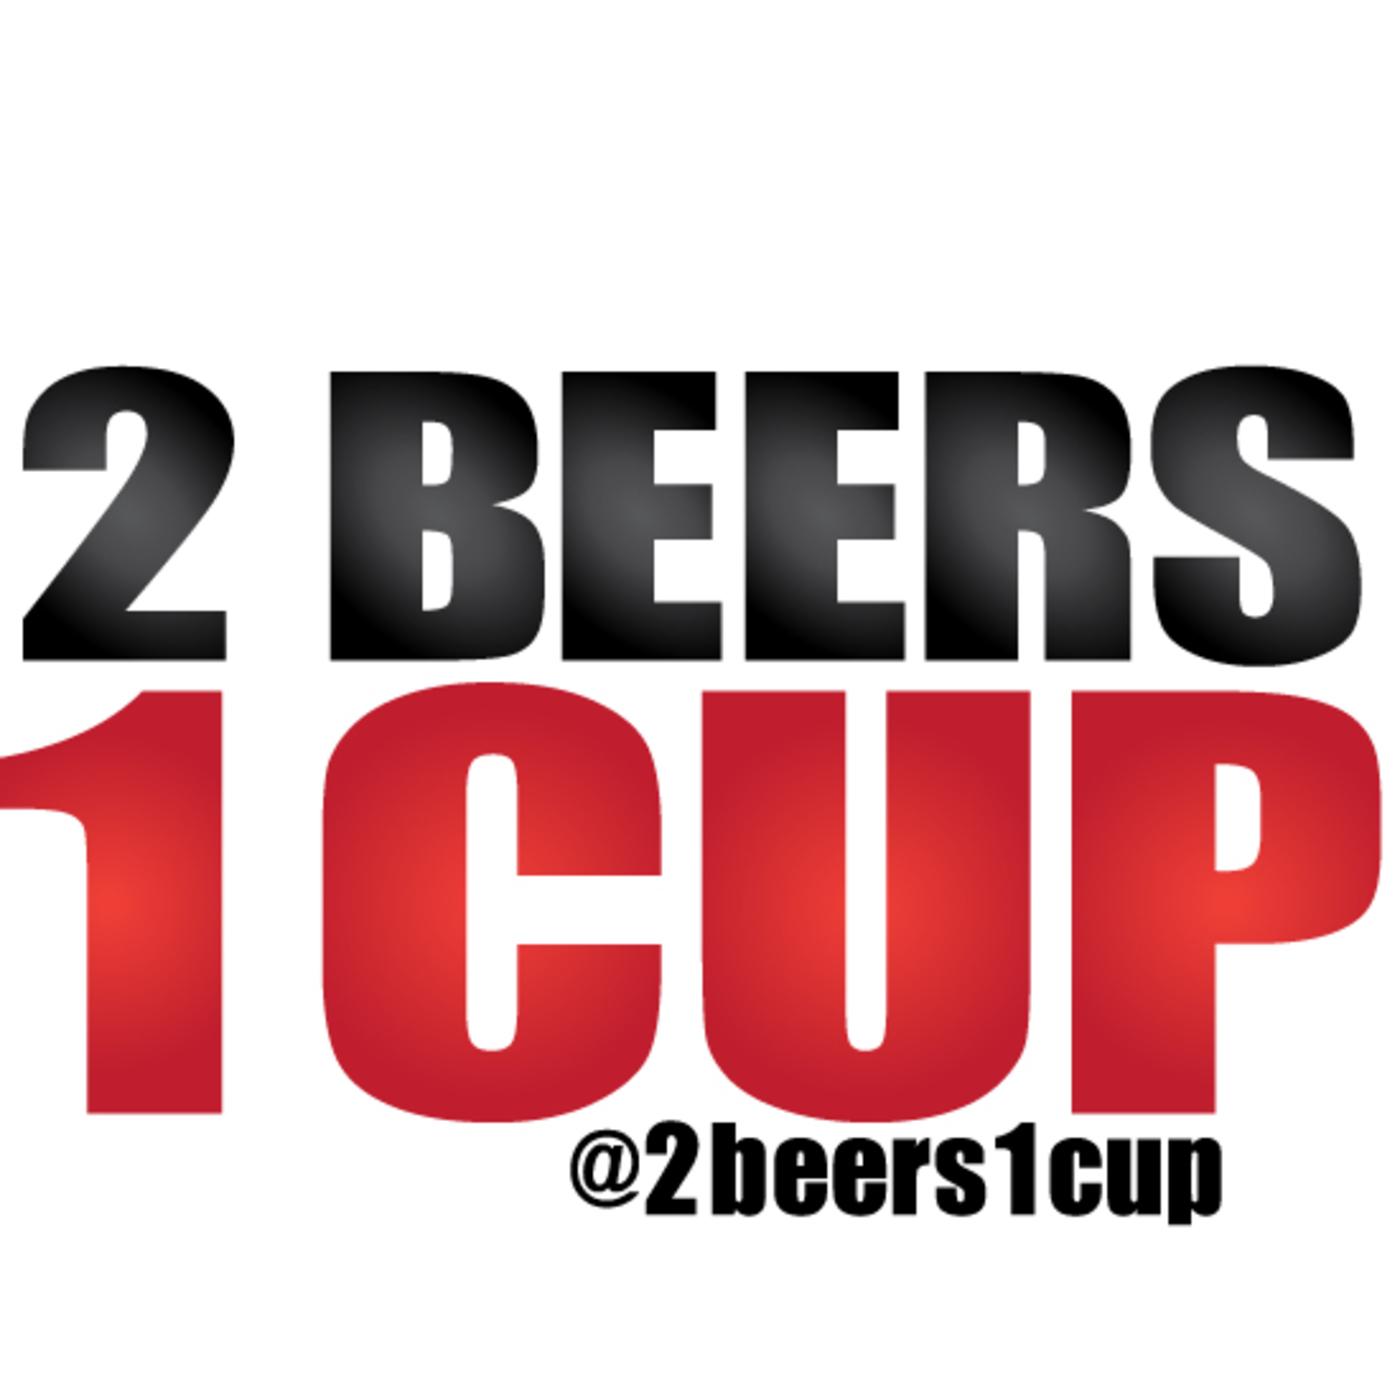 2 Beers 1 Cup